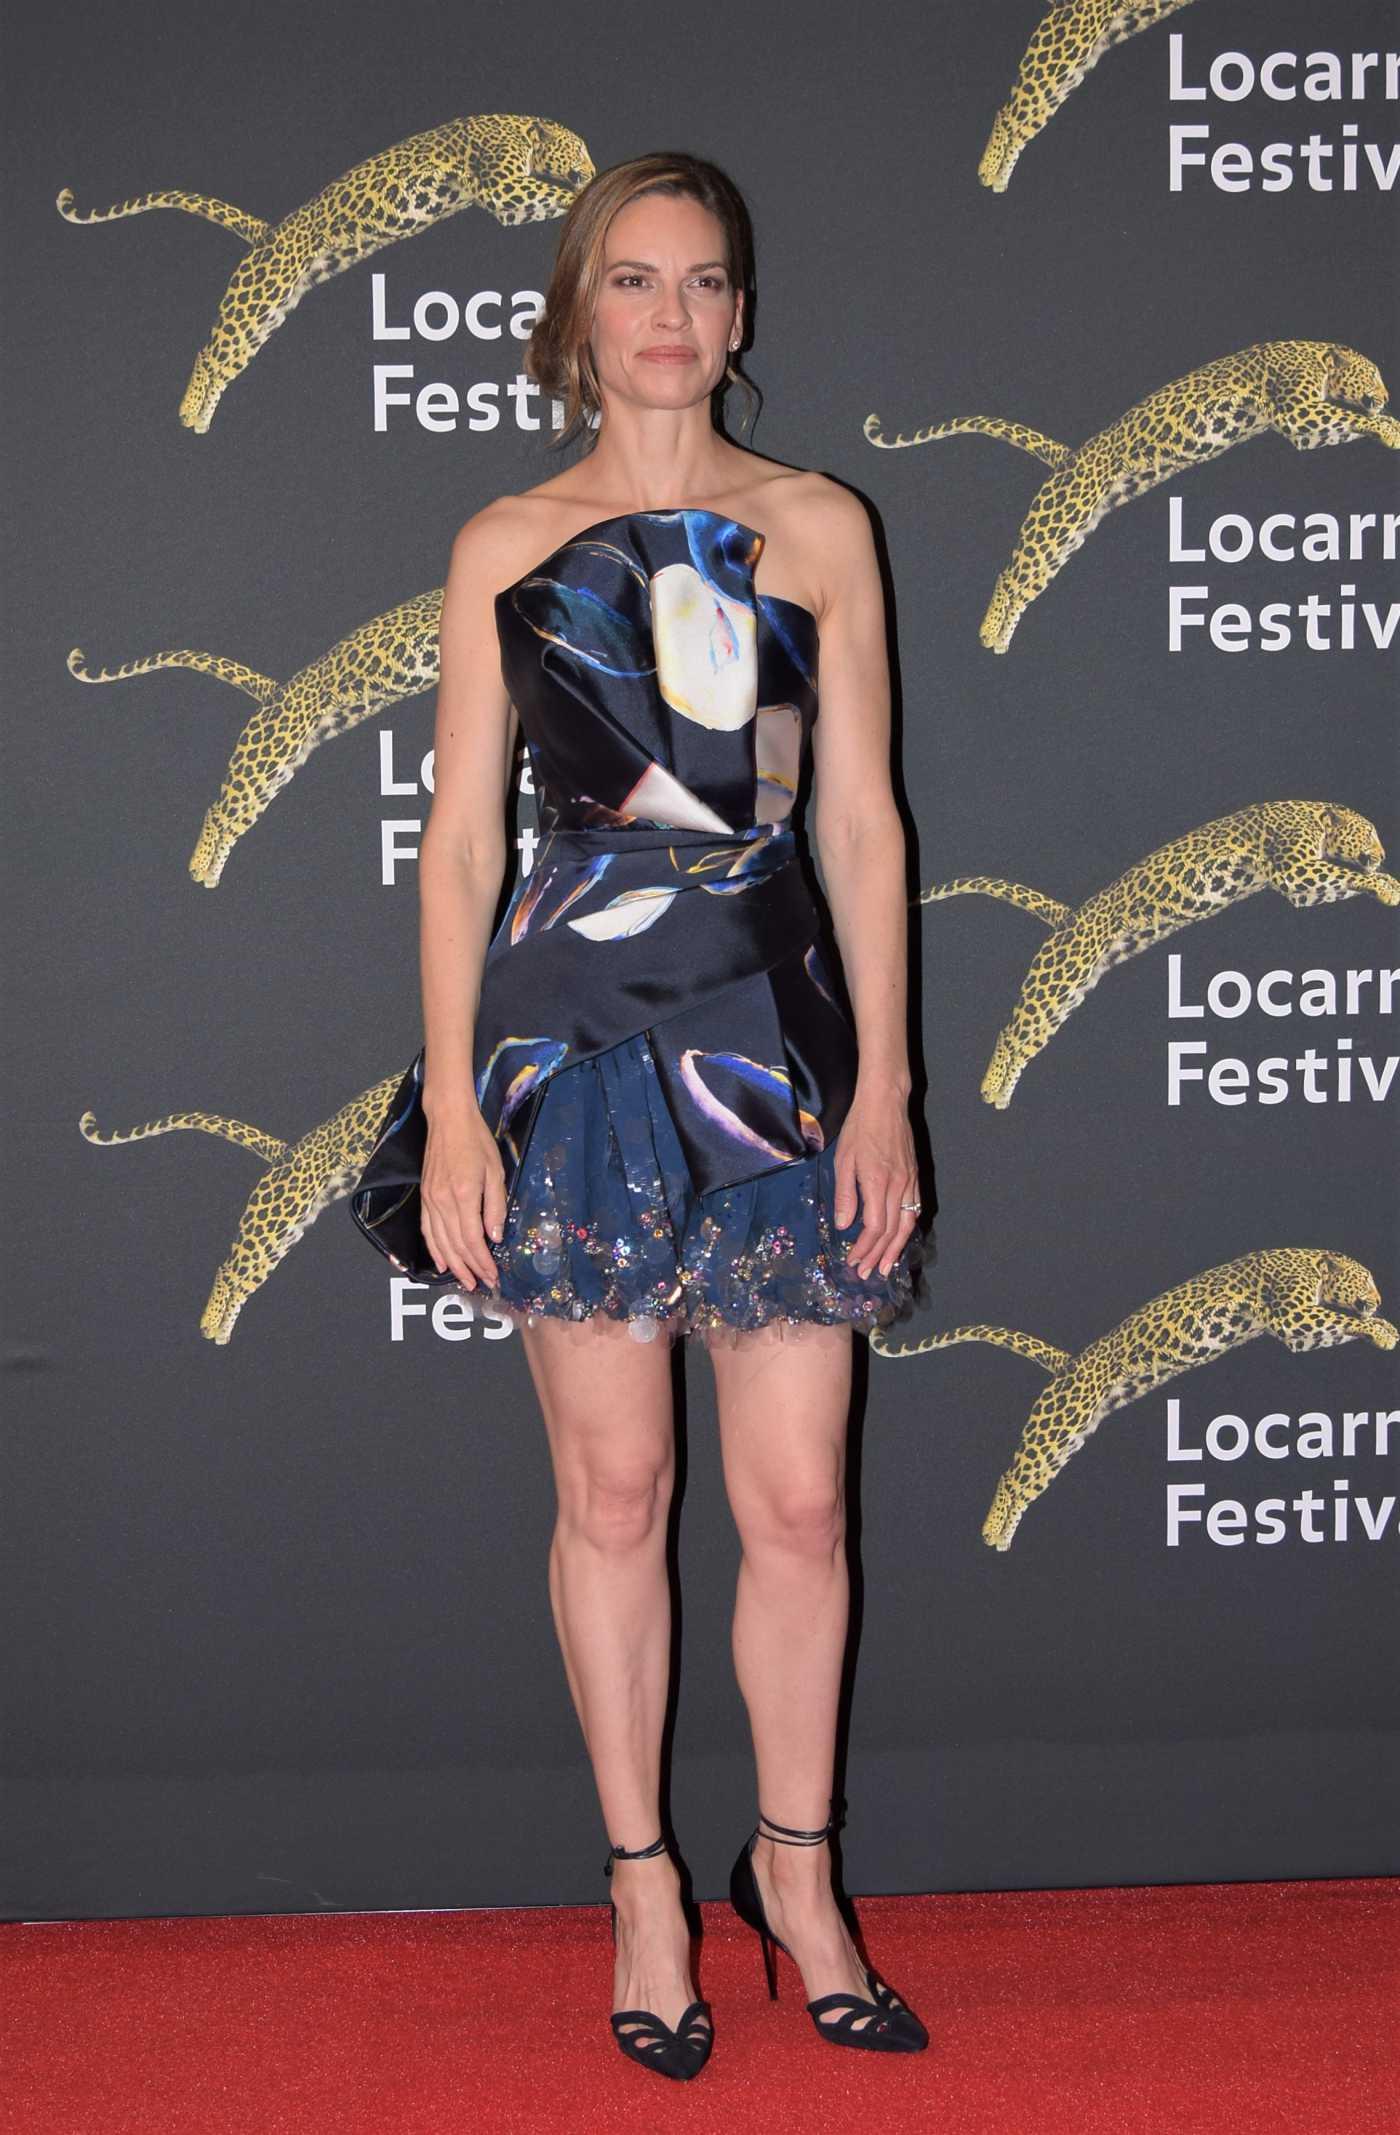 Hilary Swank Receivs the Leopard Club Award at 2019 Locarno Film Festival in Switzerland 08/09/2019